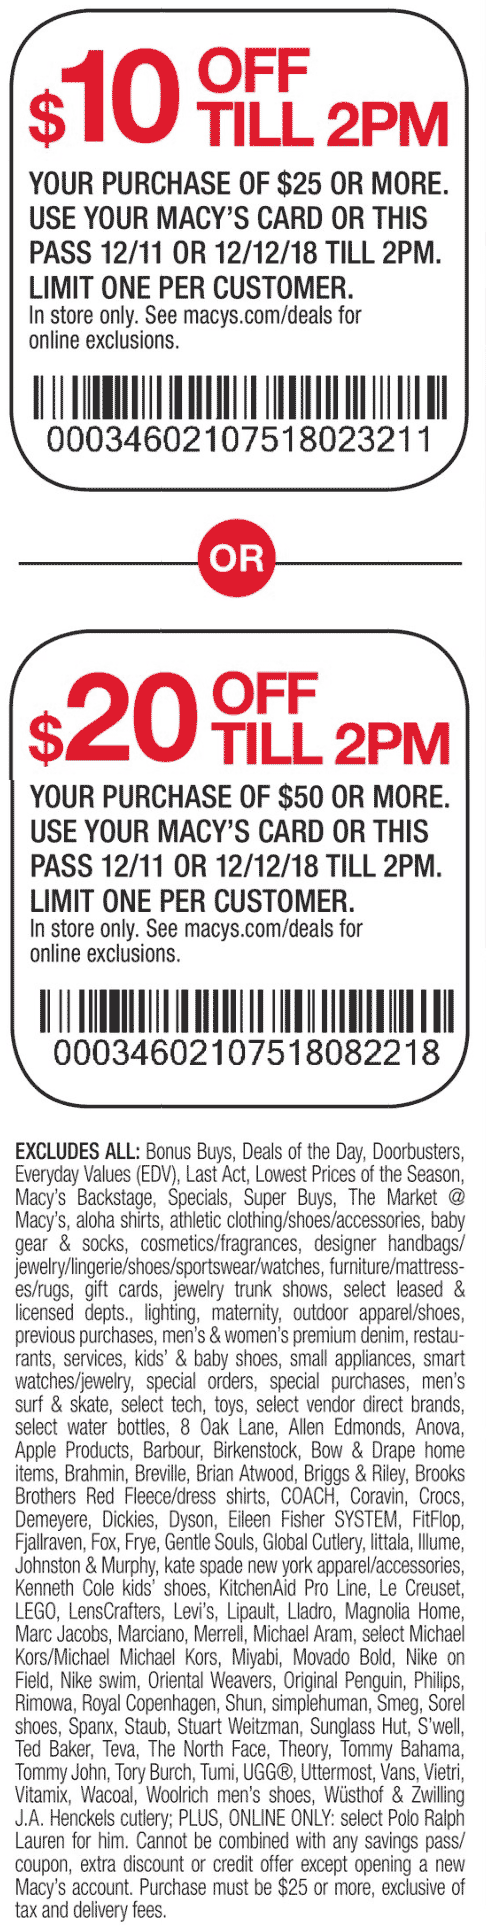 Macys Coupon August 2019 $10 off $25 & more til 2pm at Macys